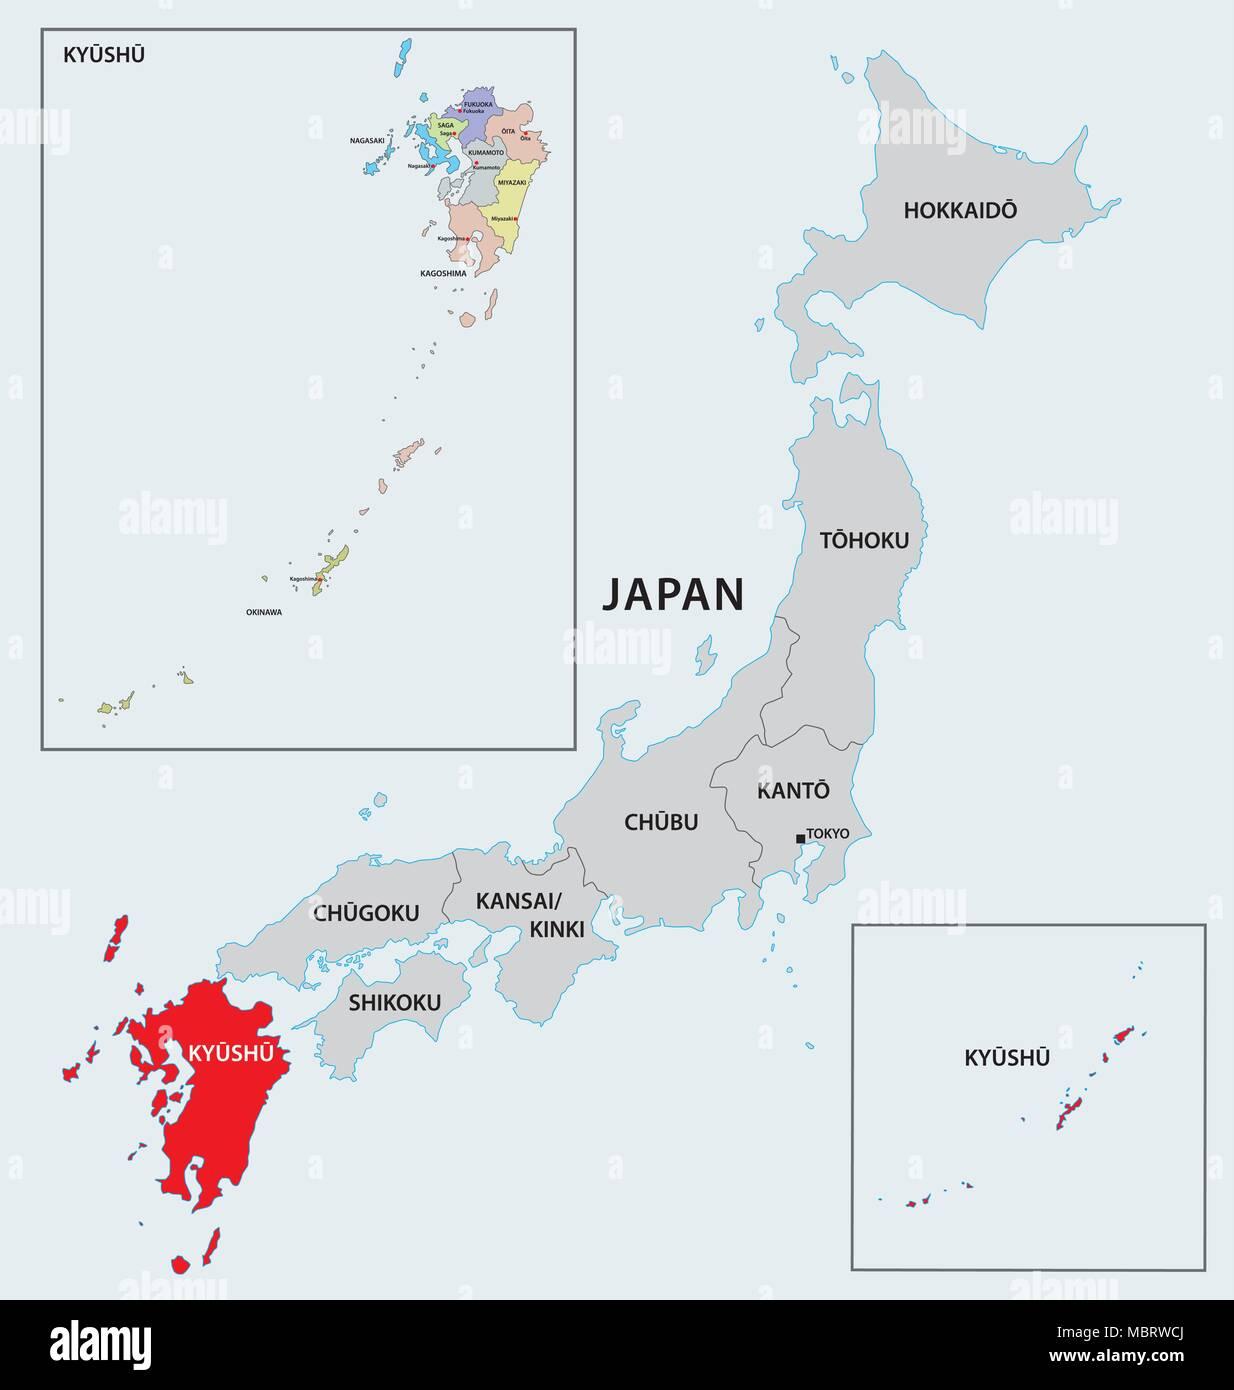 Kyushu Japan Map on aomori prefecture japan map, edo japan map, thailand japan map, fukuoka japan map, kanagawa prefecture japan map, iwakuni japan map, nagano prefecture japan map, uruma japan map, minamata japan map, kuji japan map, mount koya japan map, dejima japan map, tokyo japan map, honshu japan map, gifu prefecture japan map, mt. fuji japan map, hokkaido japan map, shikoku japan map, nara japan map, nagasaki japan map,